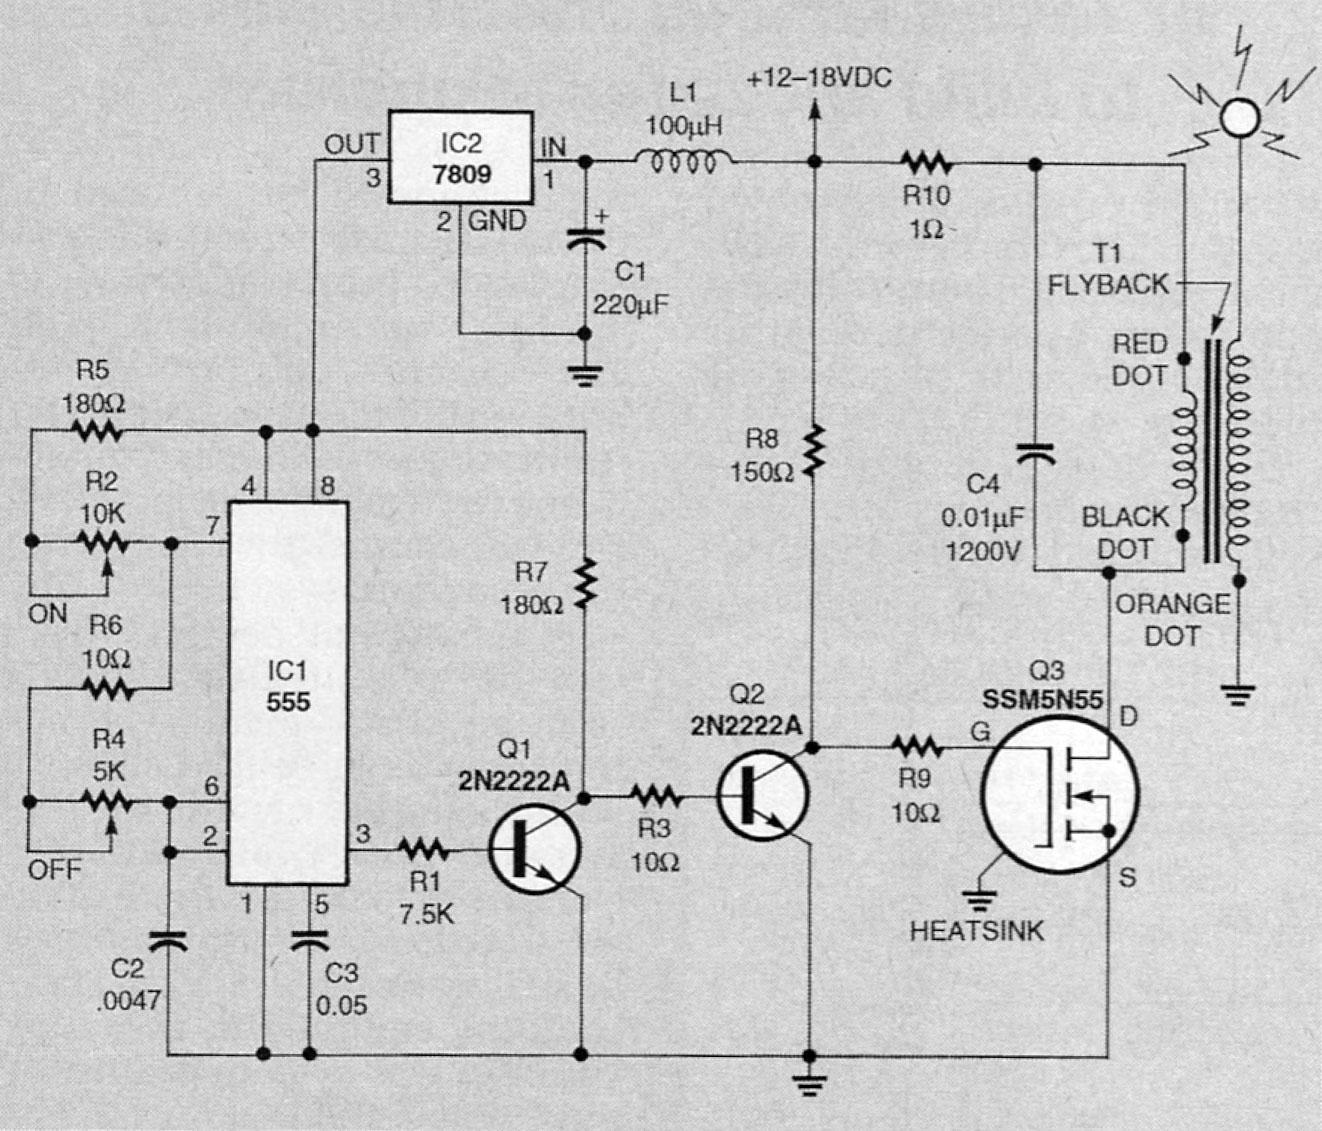 tesla coil schematic circuit solid state tesla coil circuit wiring build a solid state tesla coil [ 1322 x 1131 Pixel ]